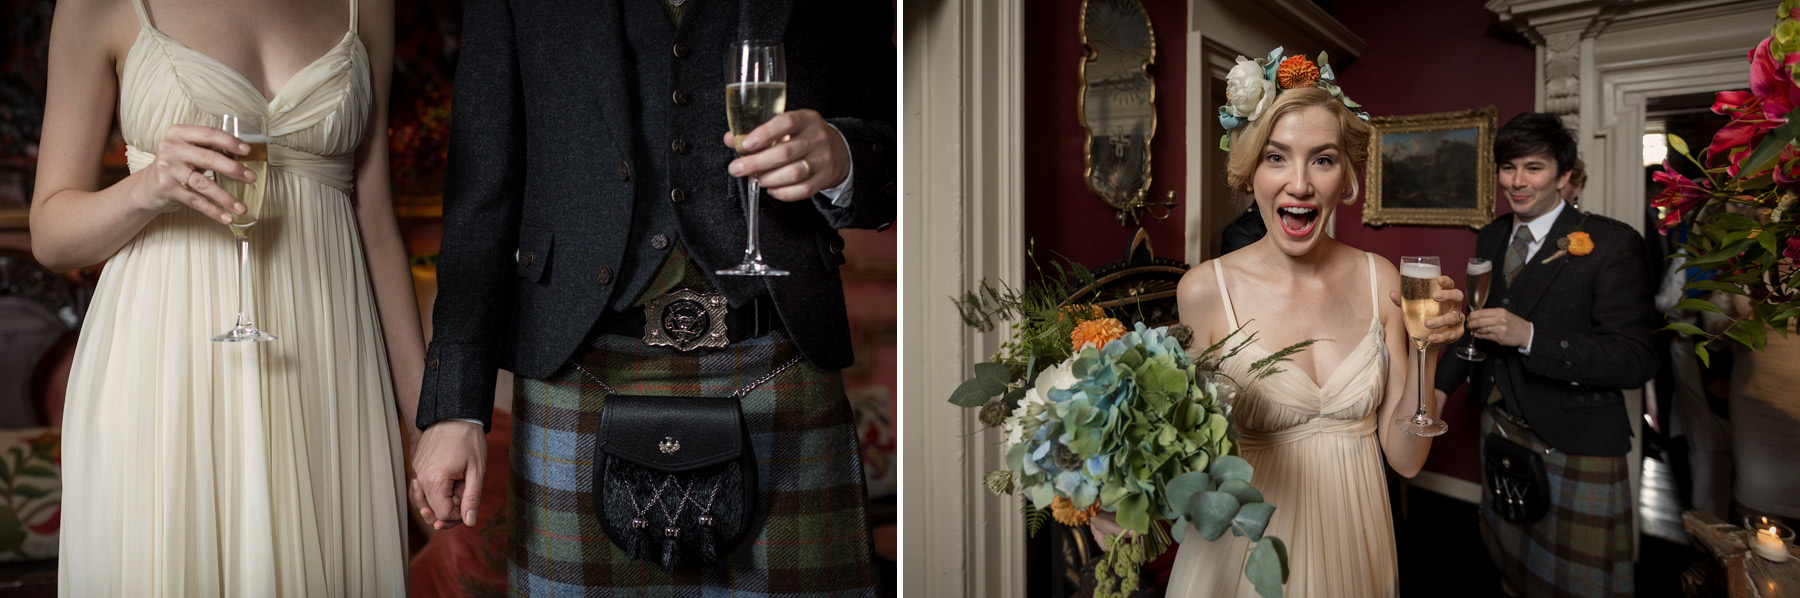 bride and groom at prestonfield house edinburgh